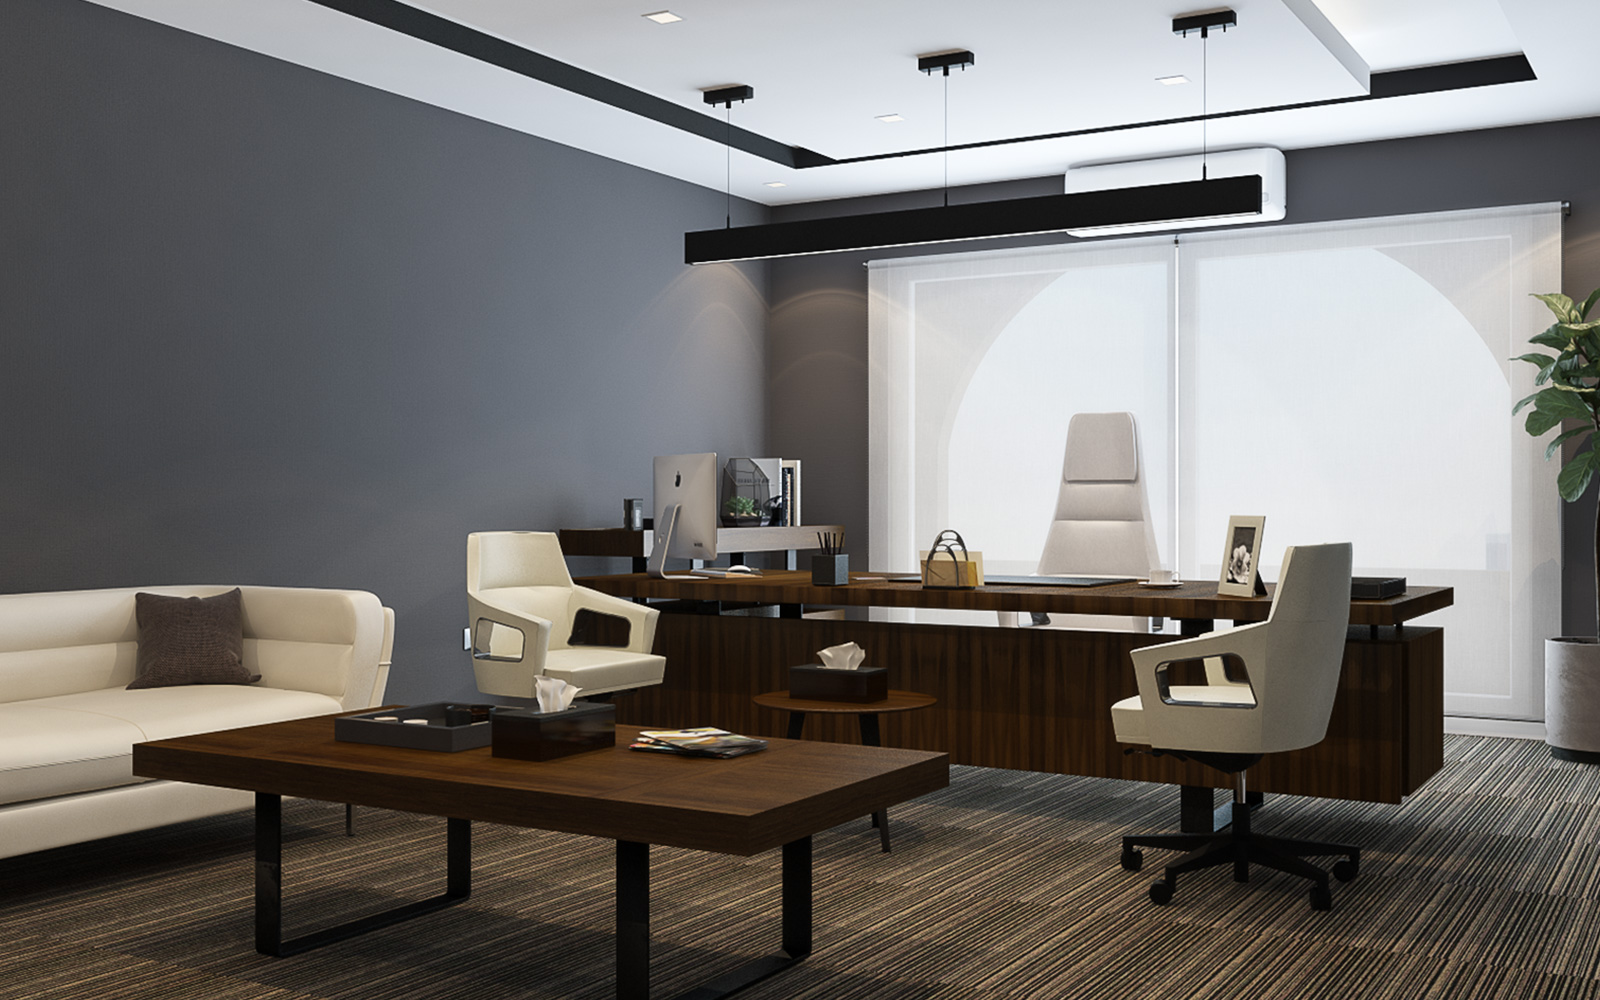 Vogue Design - UAE Al Omran Offices8